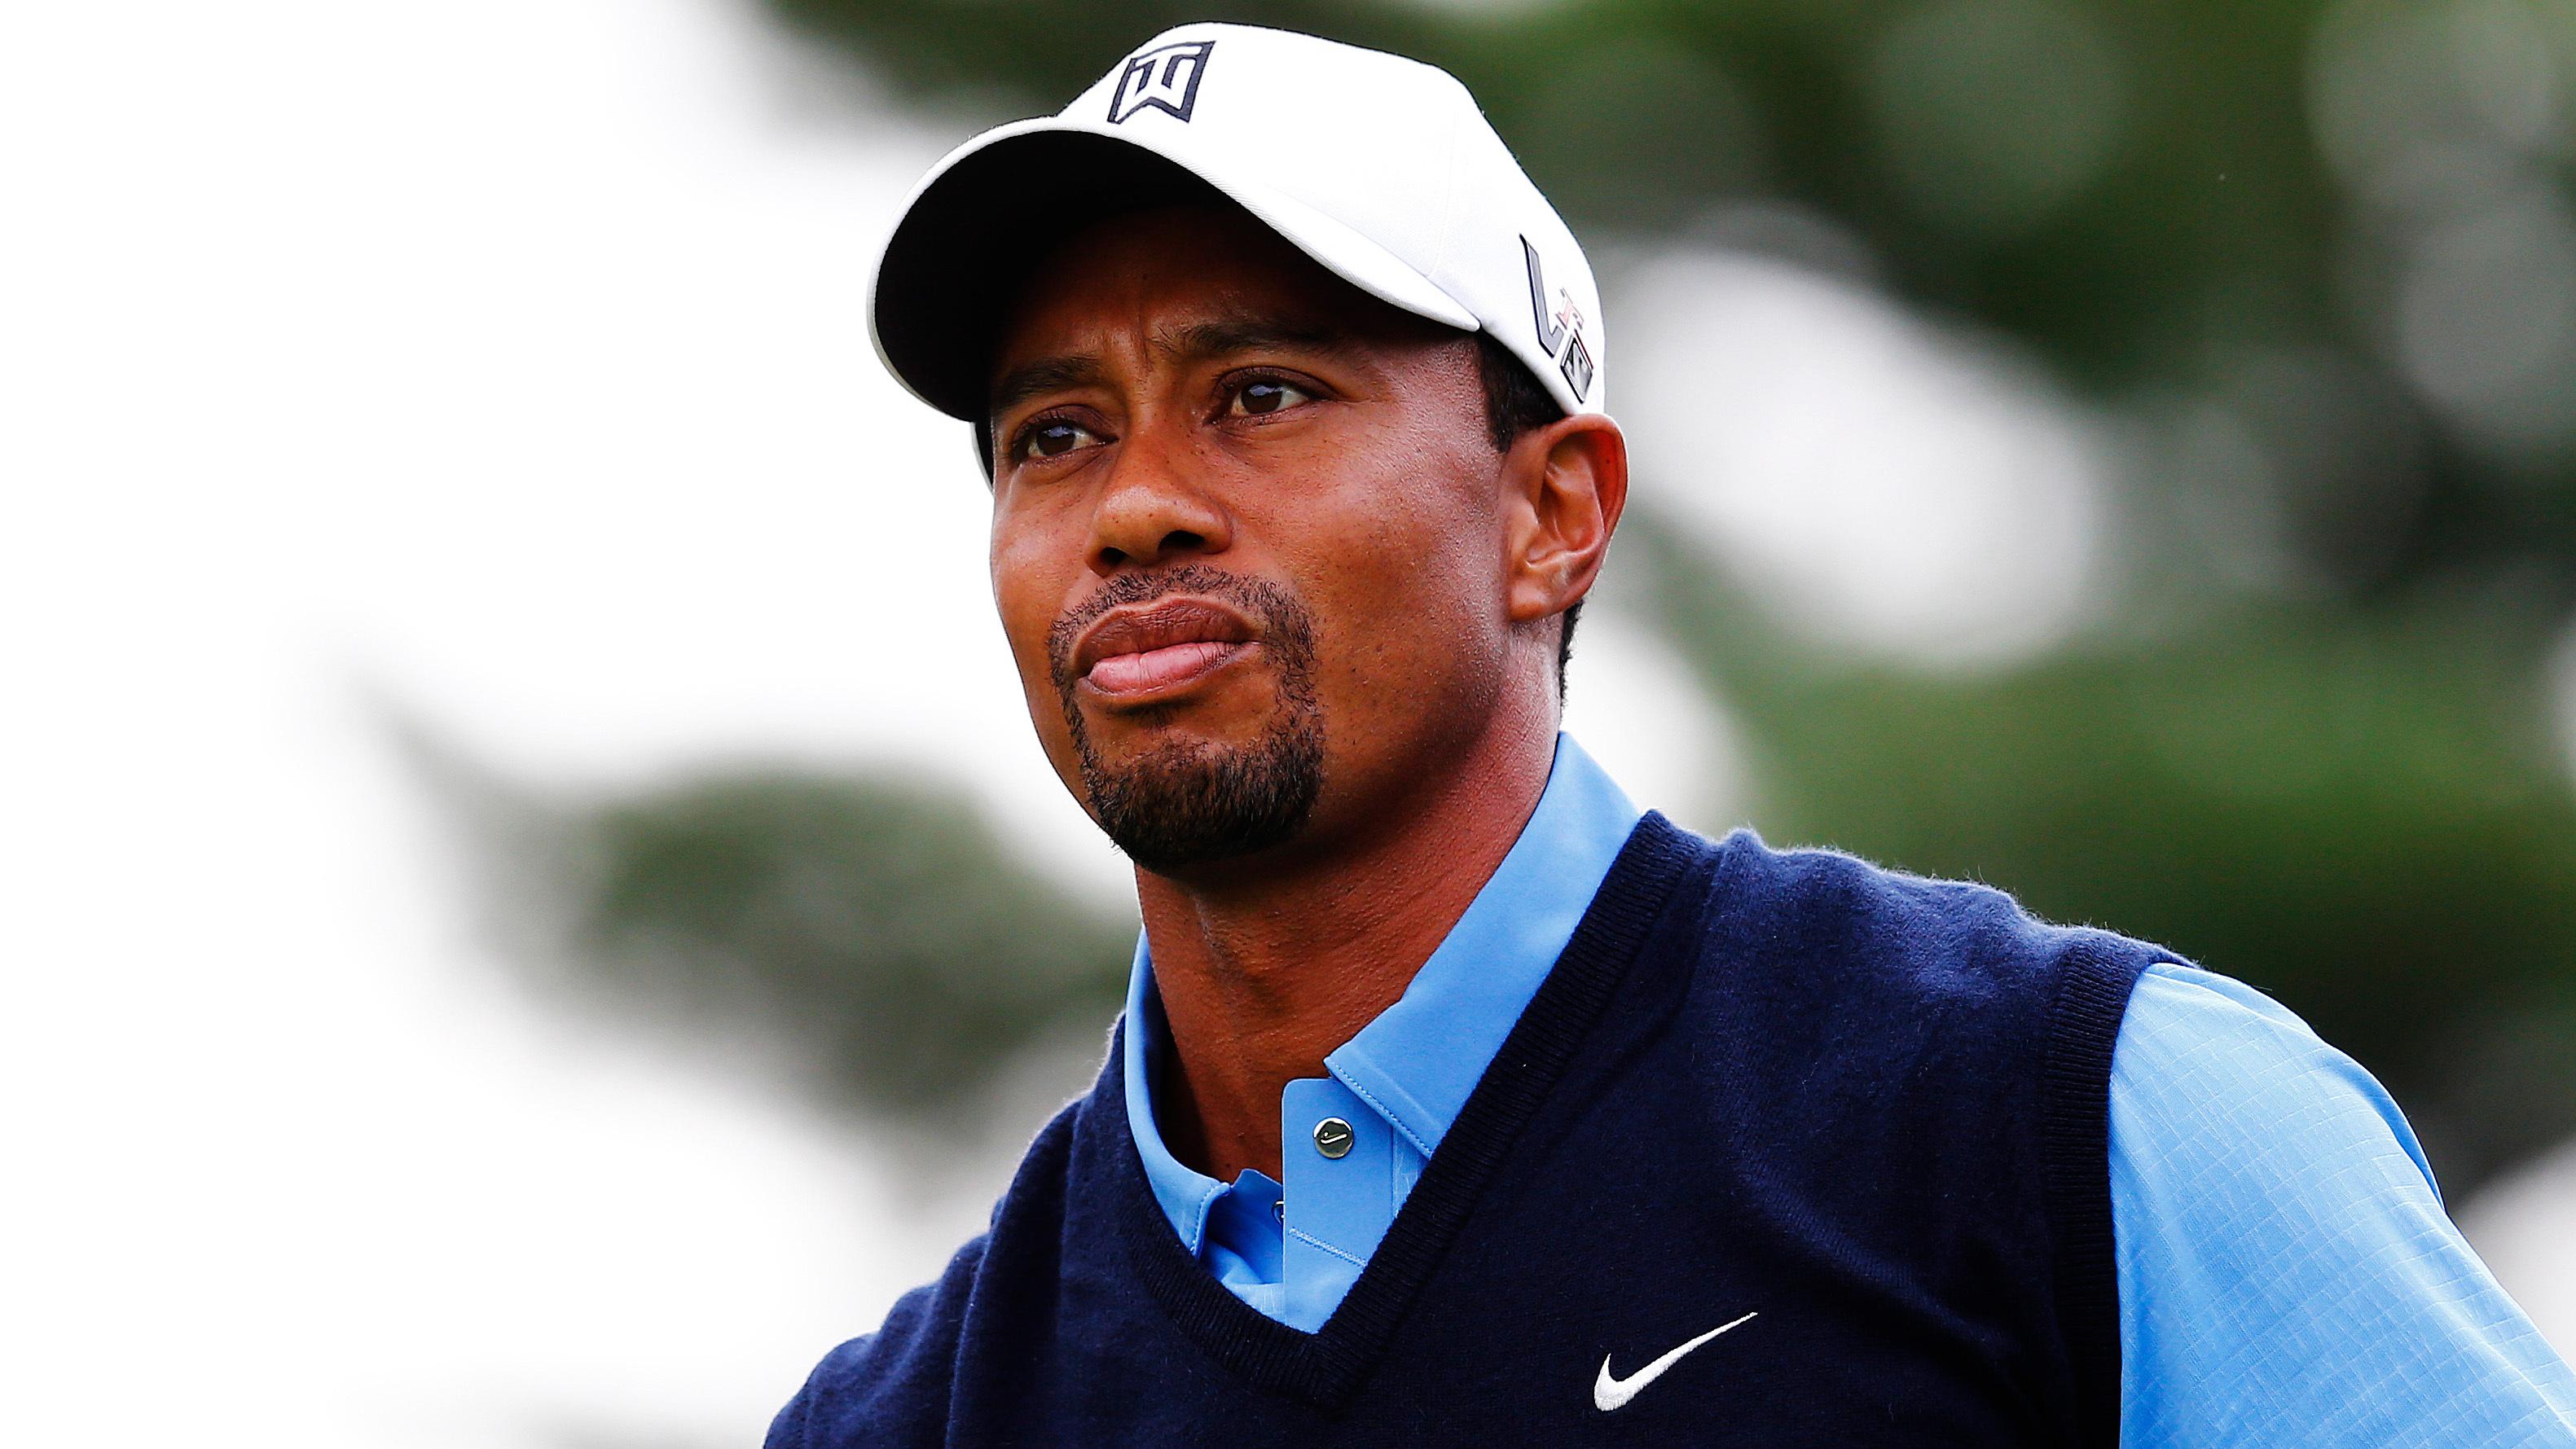 Tiger Woods HD Desktop